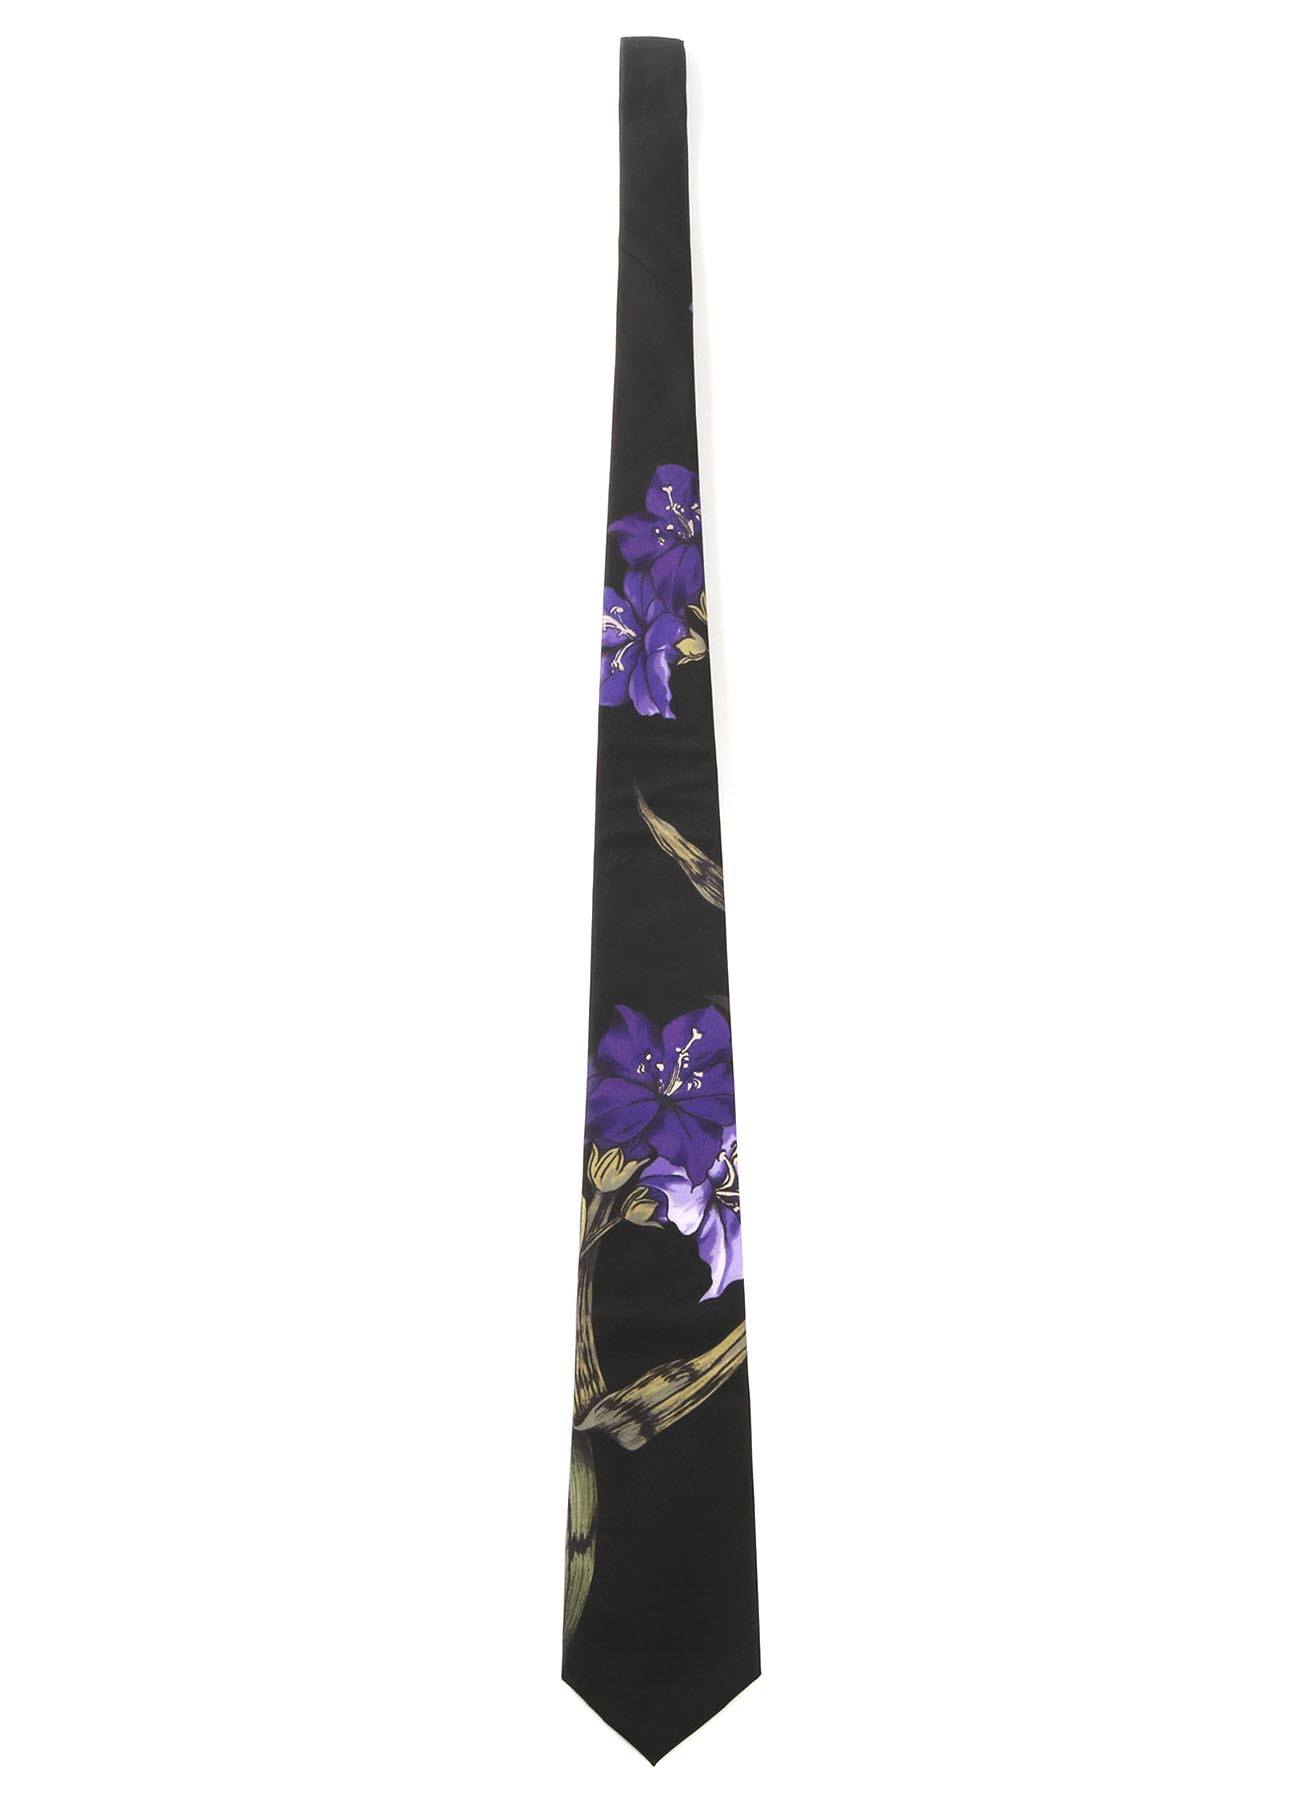 15MONME S/TWILL PT A FLOWER PRINT TIE PURPLE